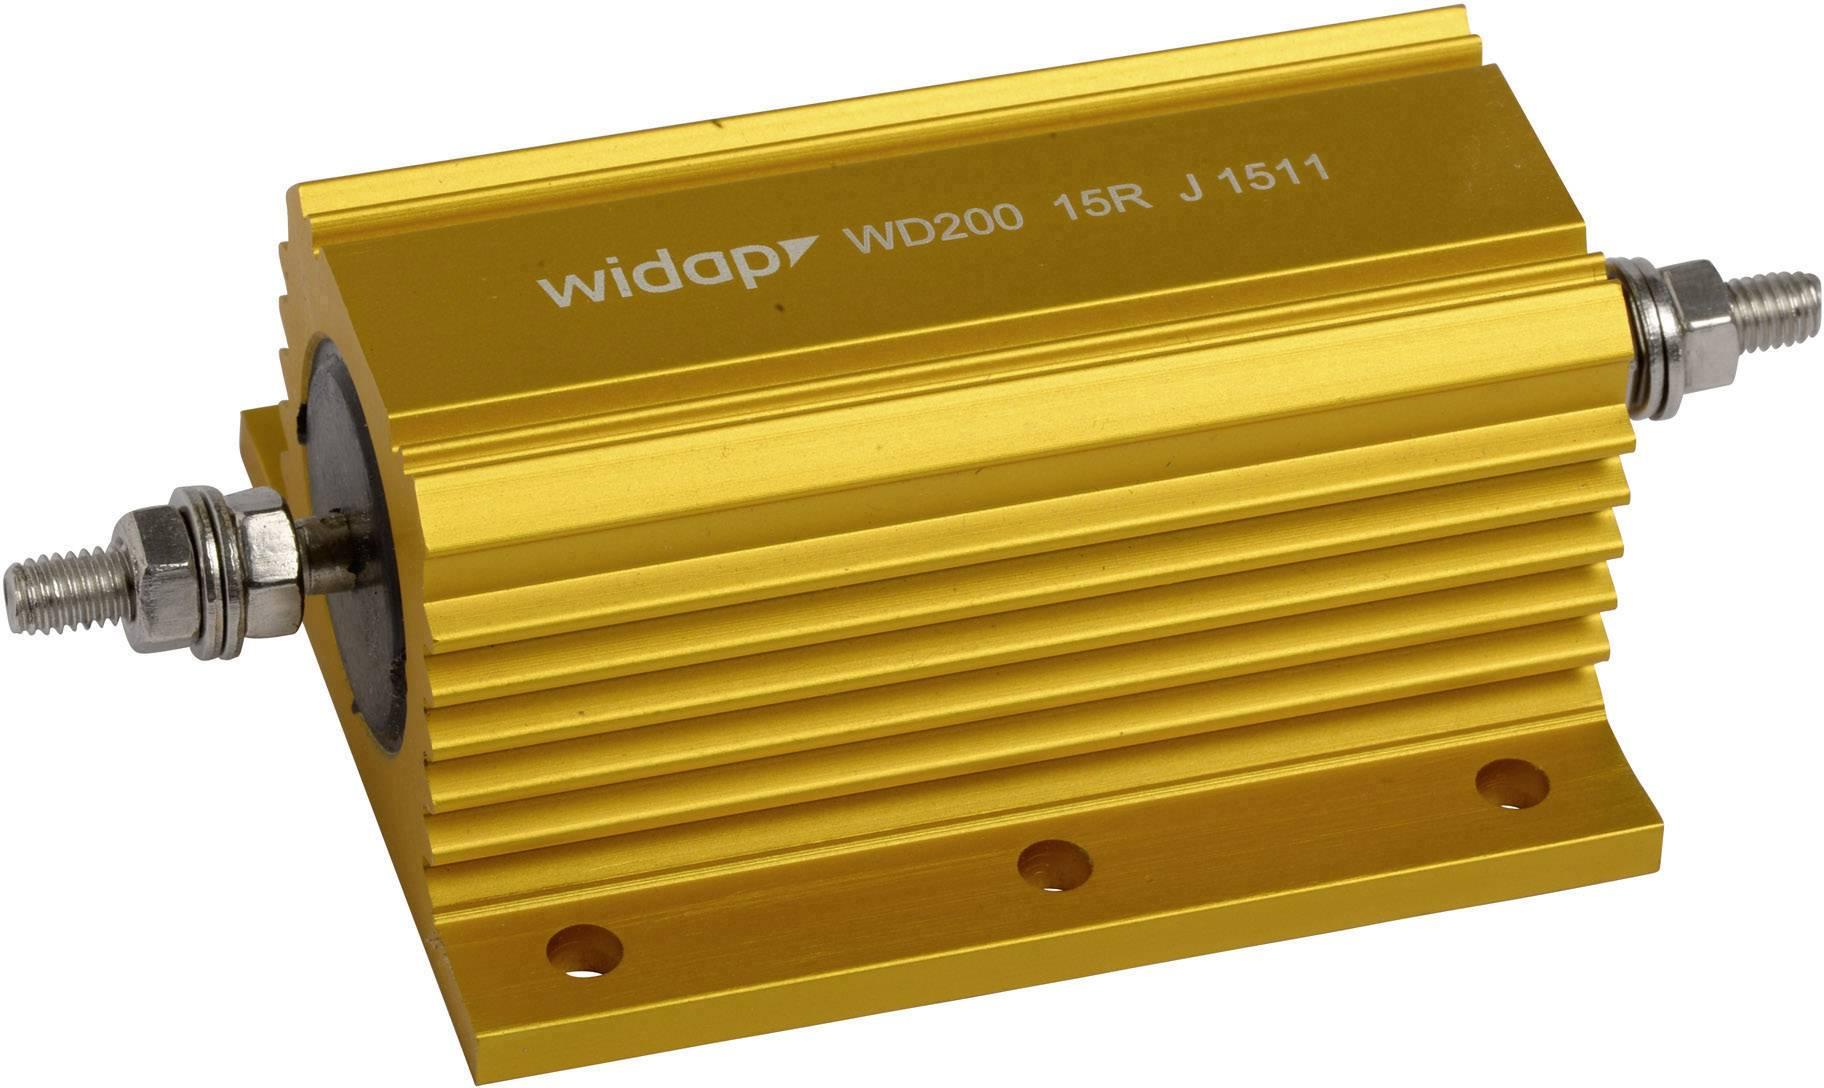 Drôtový rezistor Widap 160145, hodnota odporu 1.5 Ohm, 200 W, 1 ks